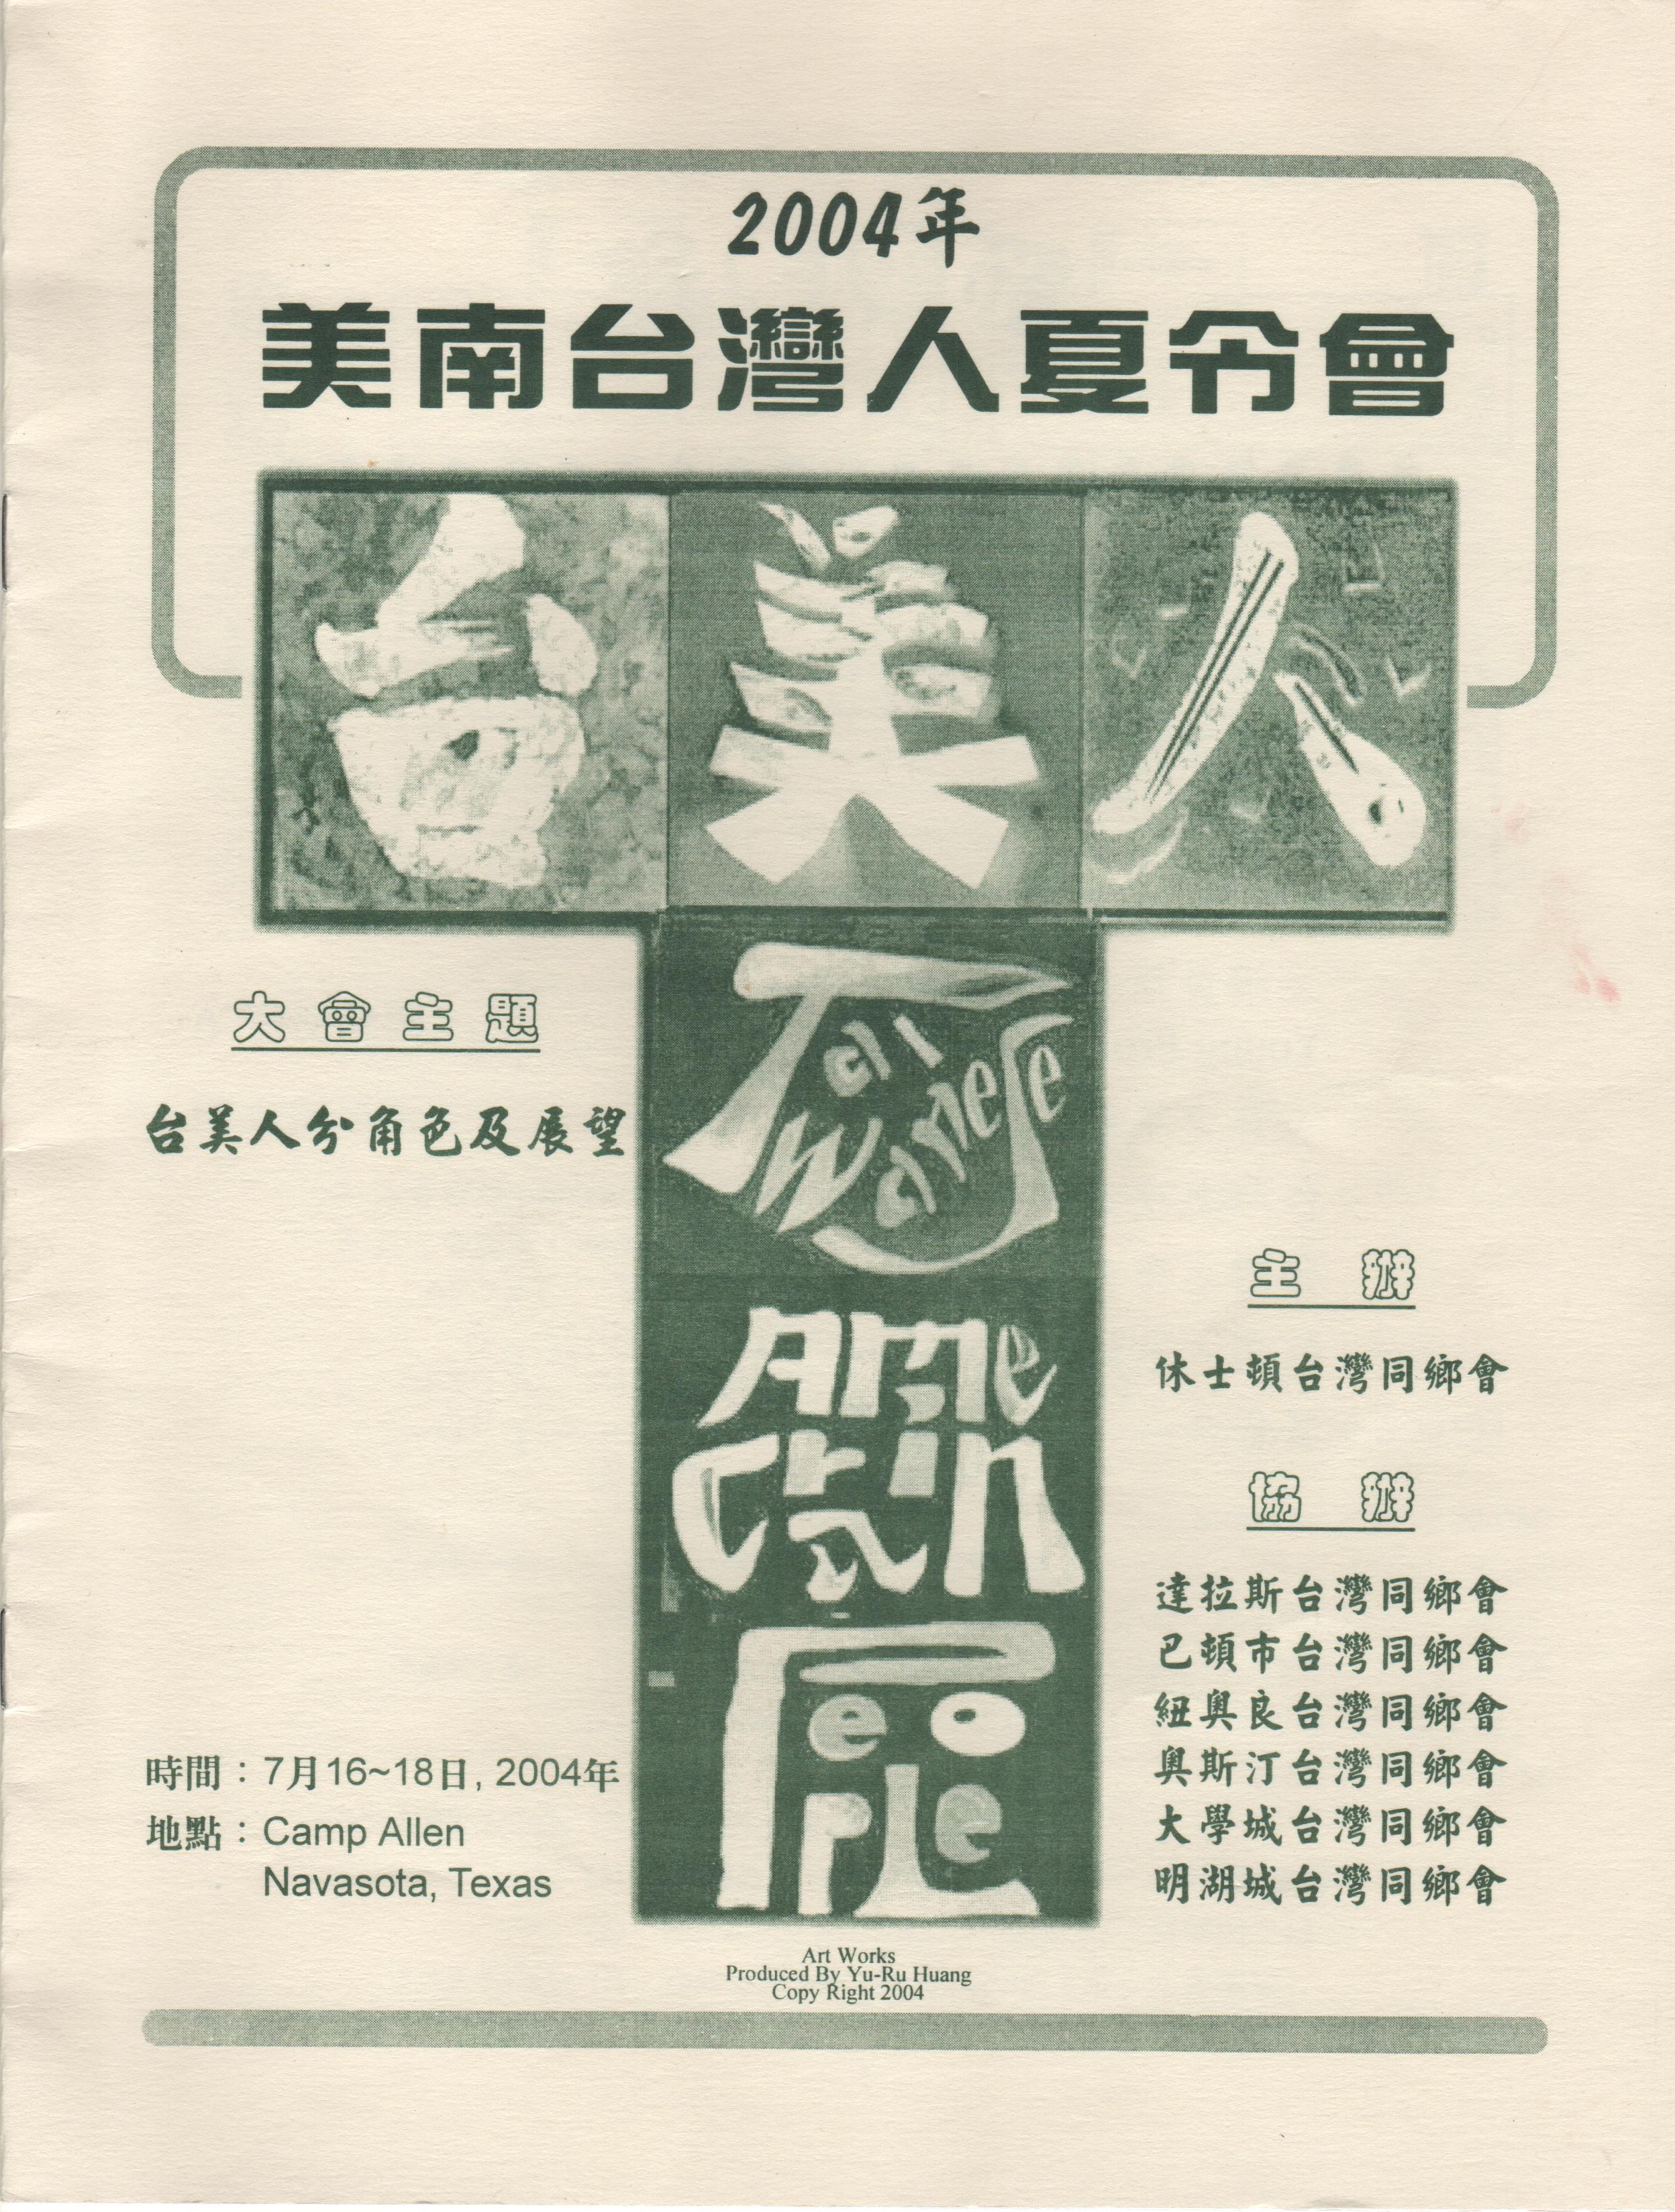 TACSR 2004